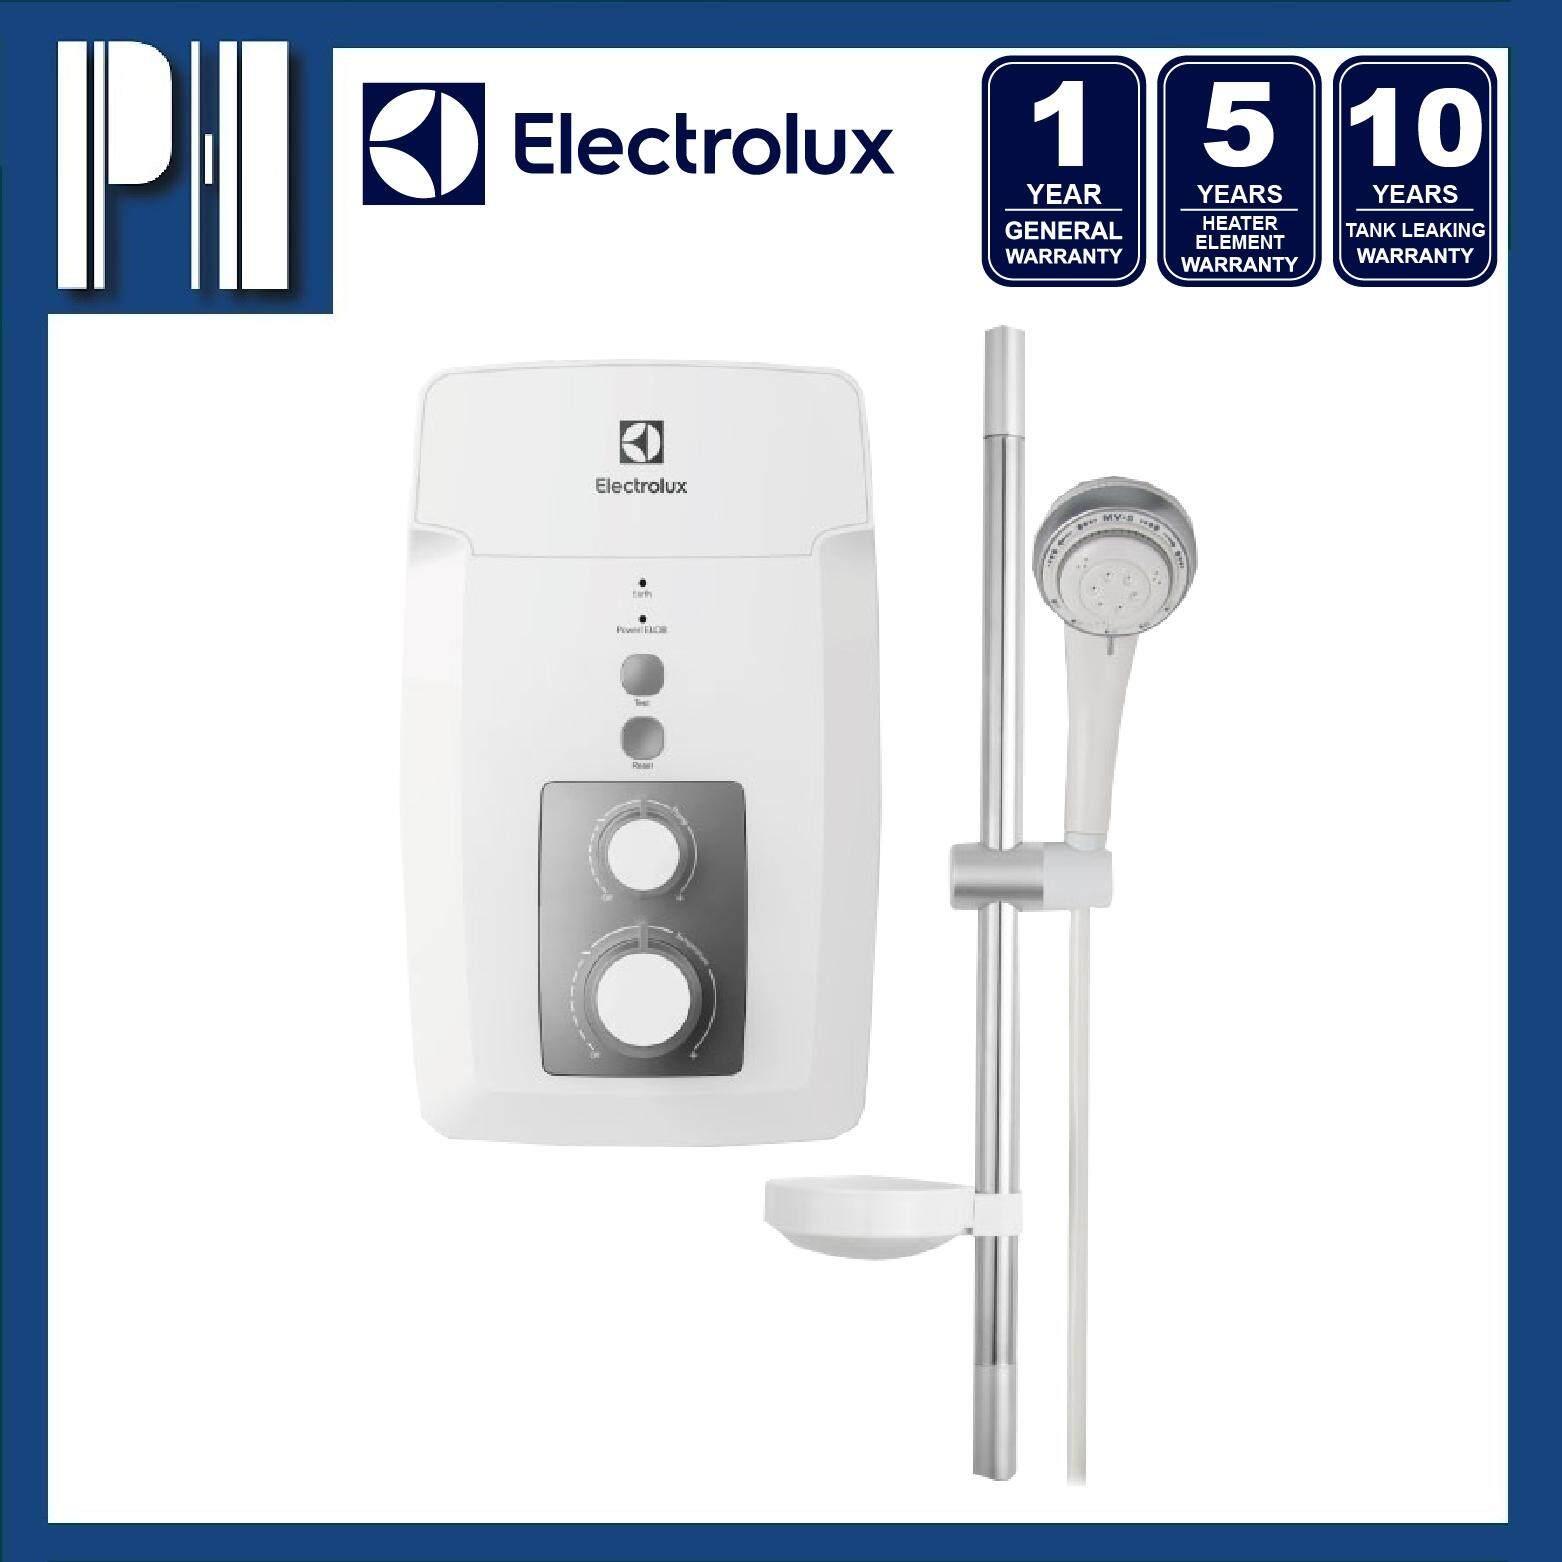 ELECTROLUX EWE361GA-DWS 3600W Allure II Booster Pump Water Heater